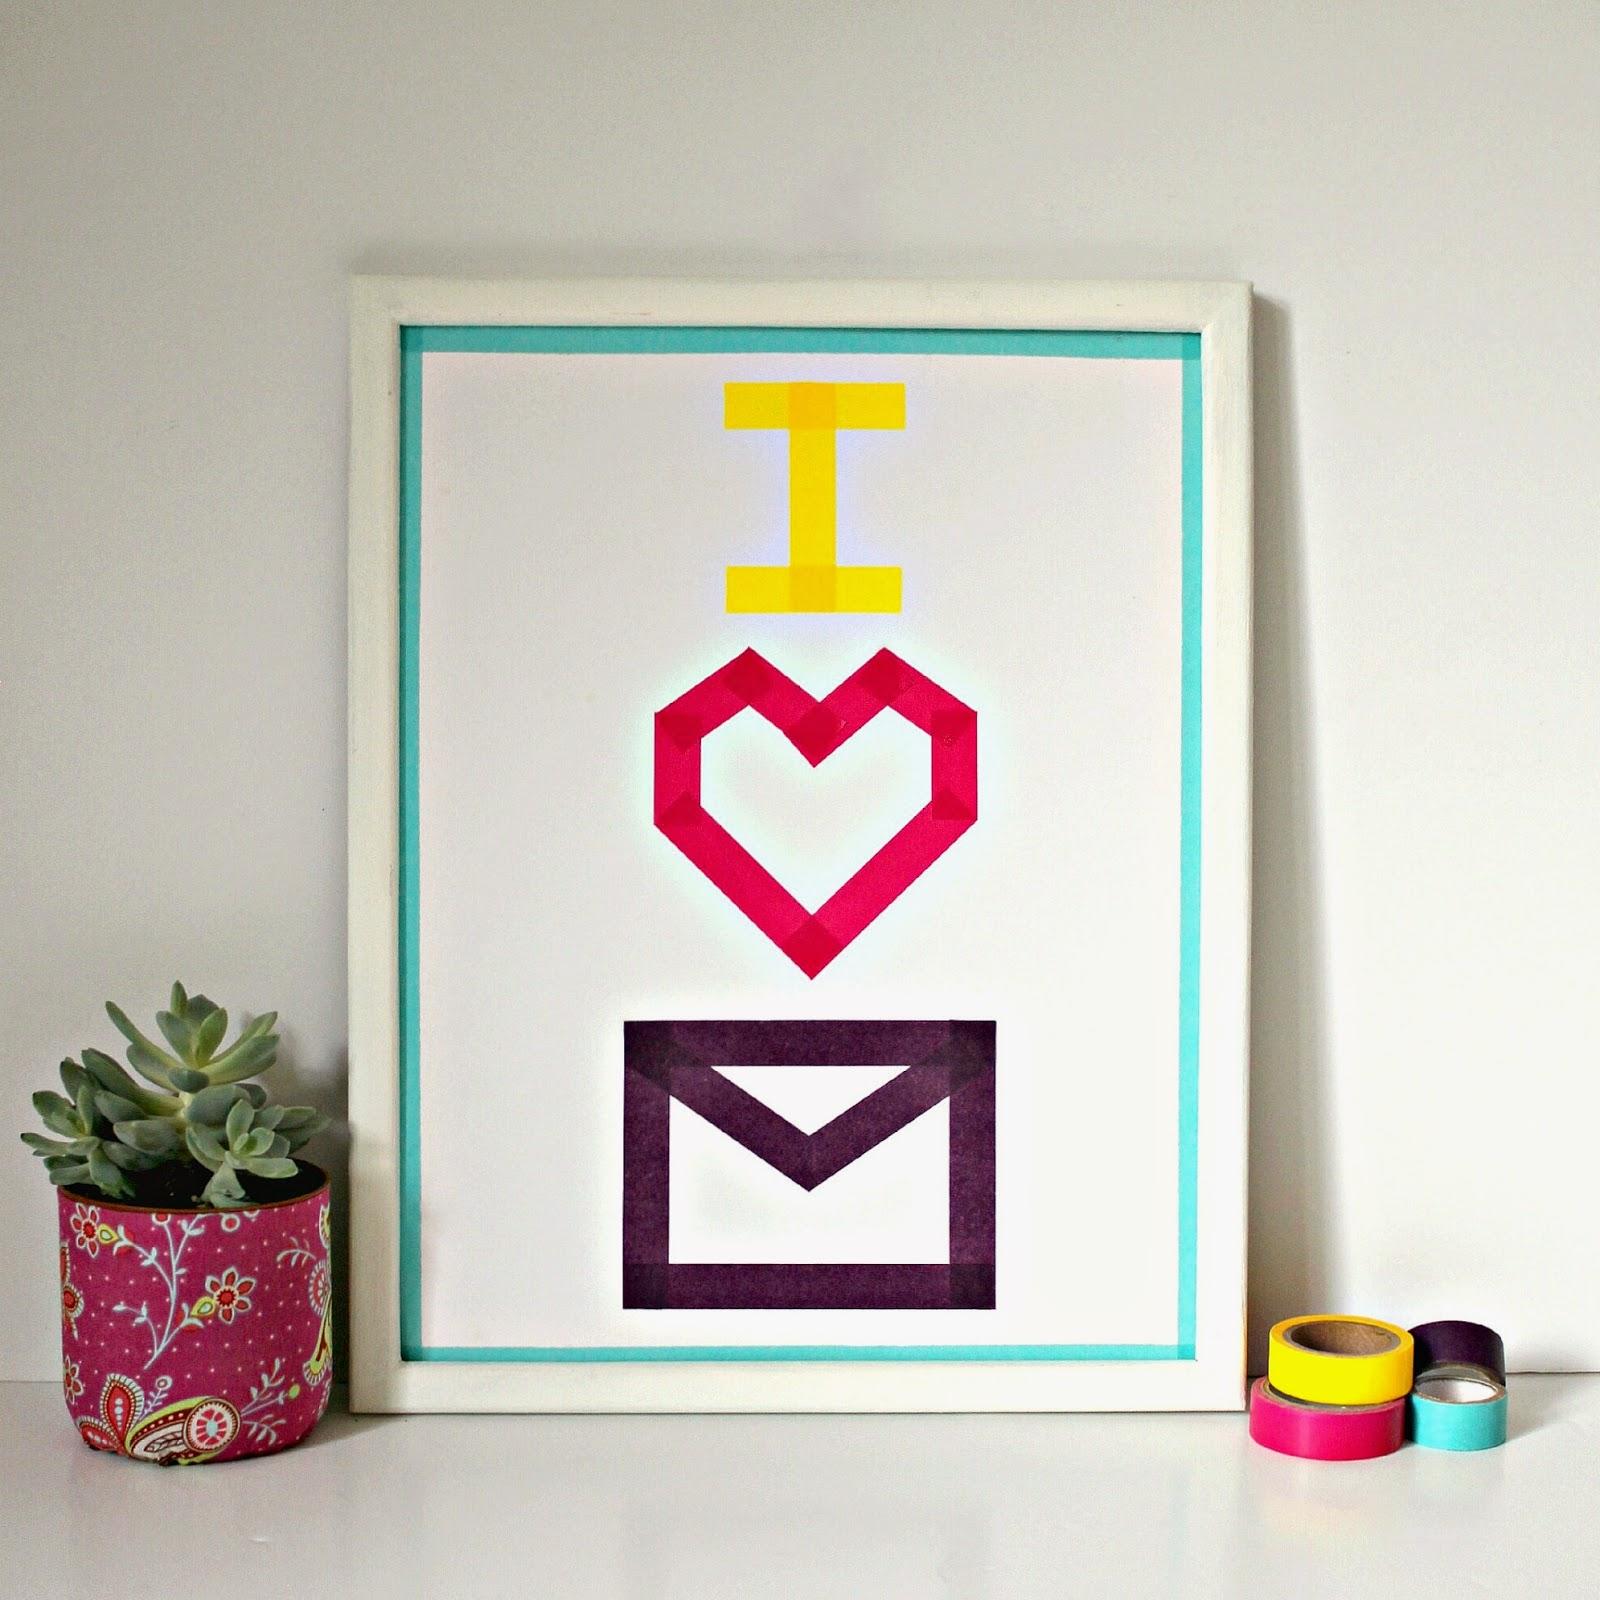 diy easy 10 minute washi tape art for mail lovers. Black Bedroom Furniture Sets. Home Design Ideas